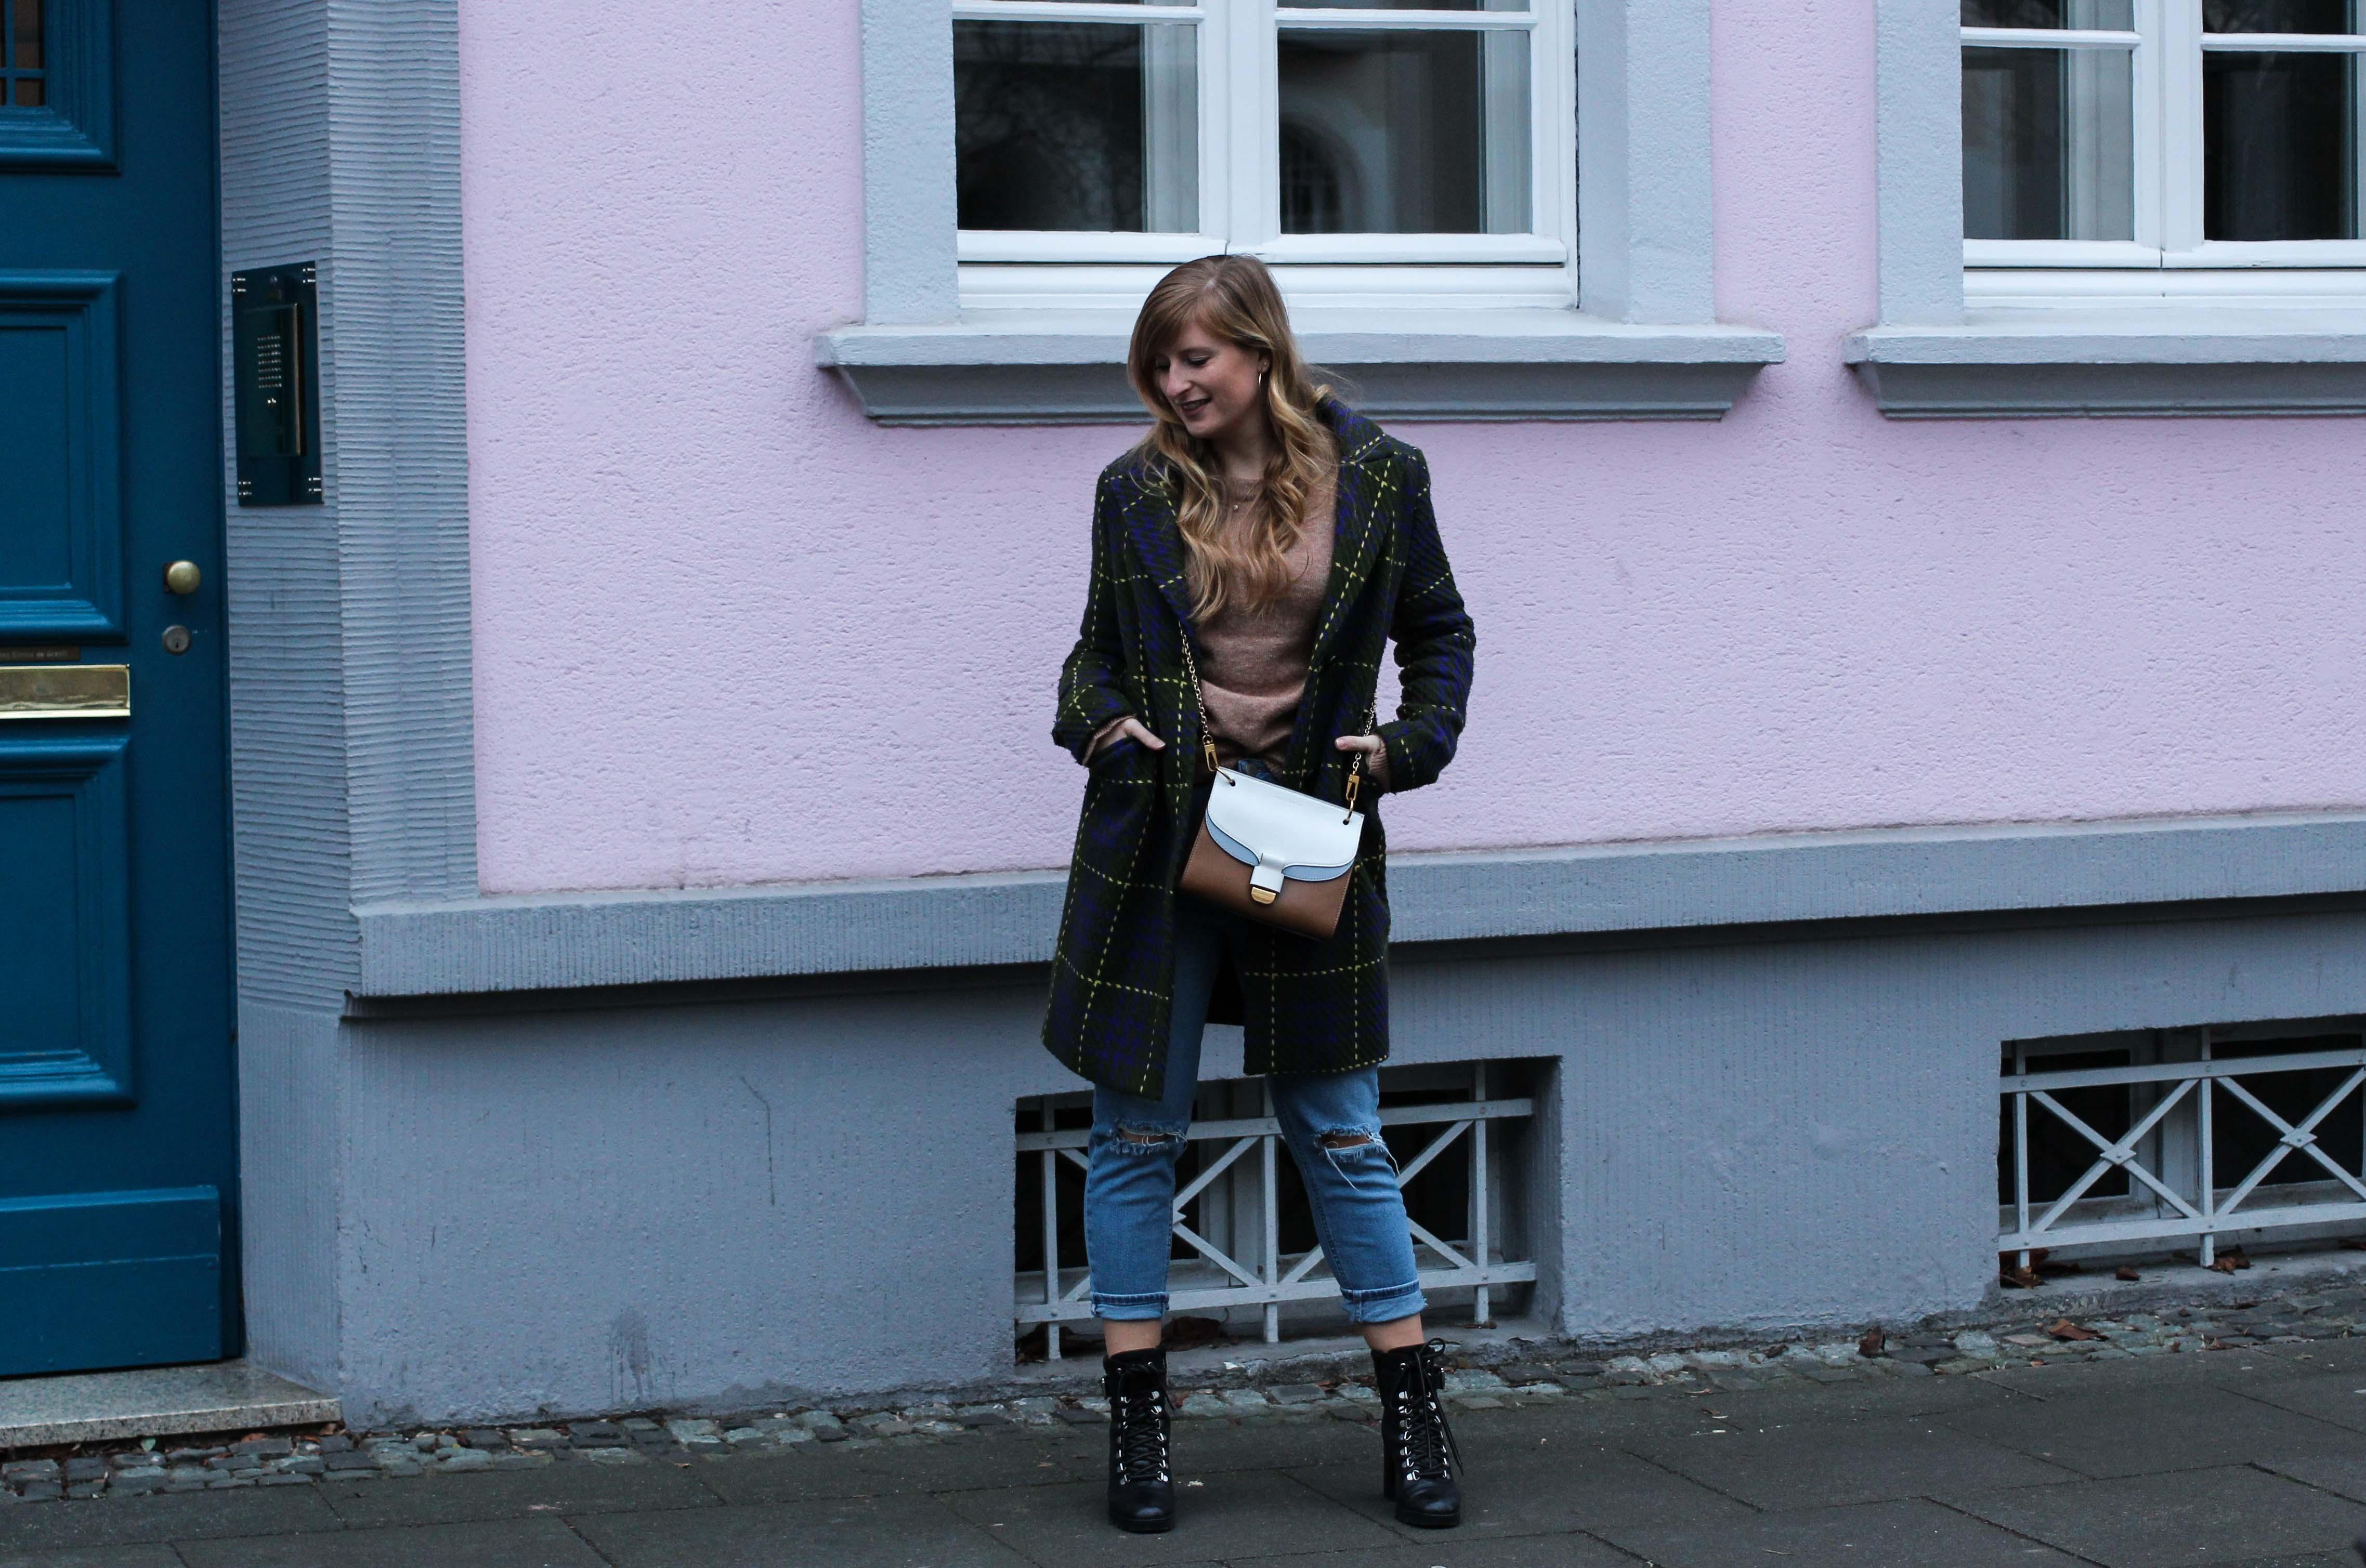 Herbst Must-Have 2019 Karomantel. Herbstmode Herbsttrend Mantel karriert Modeblog Outfit Herbst Fashion Blog Bonn 9